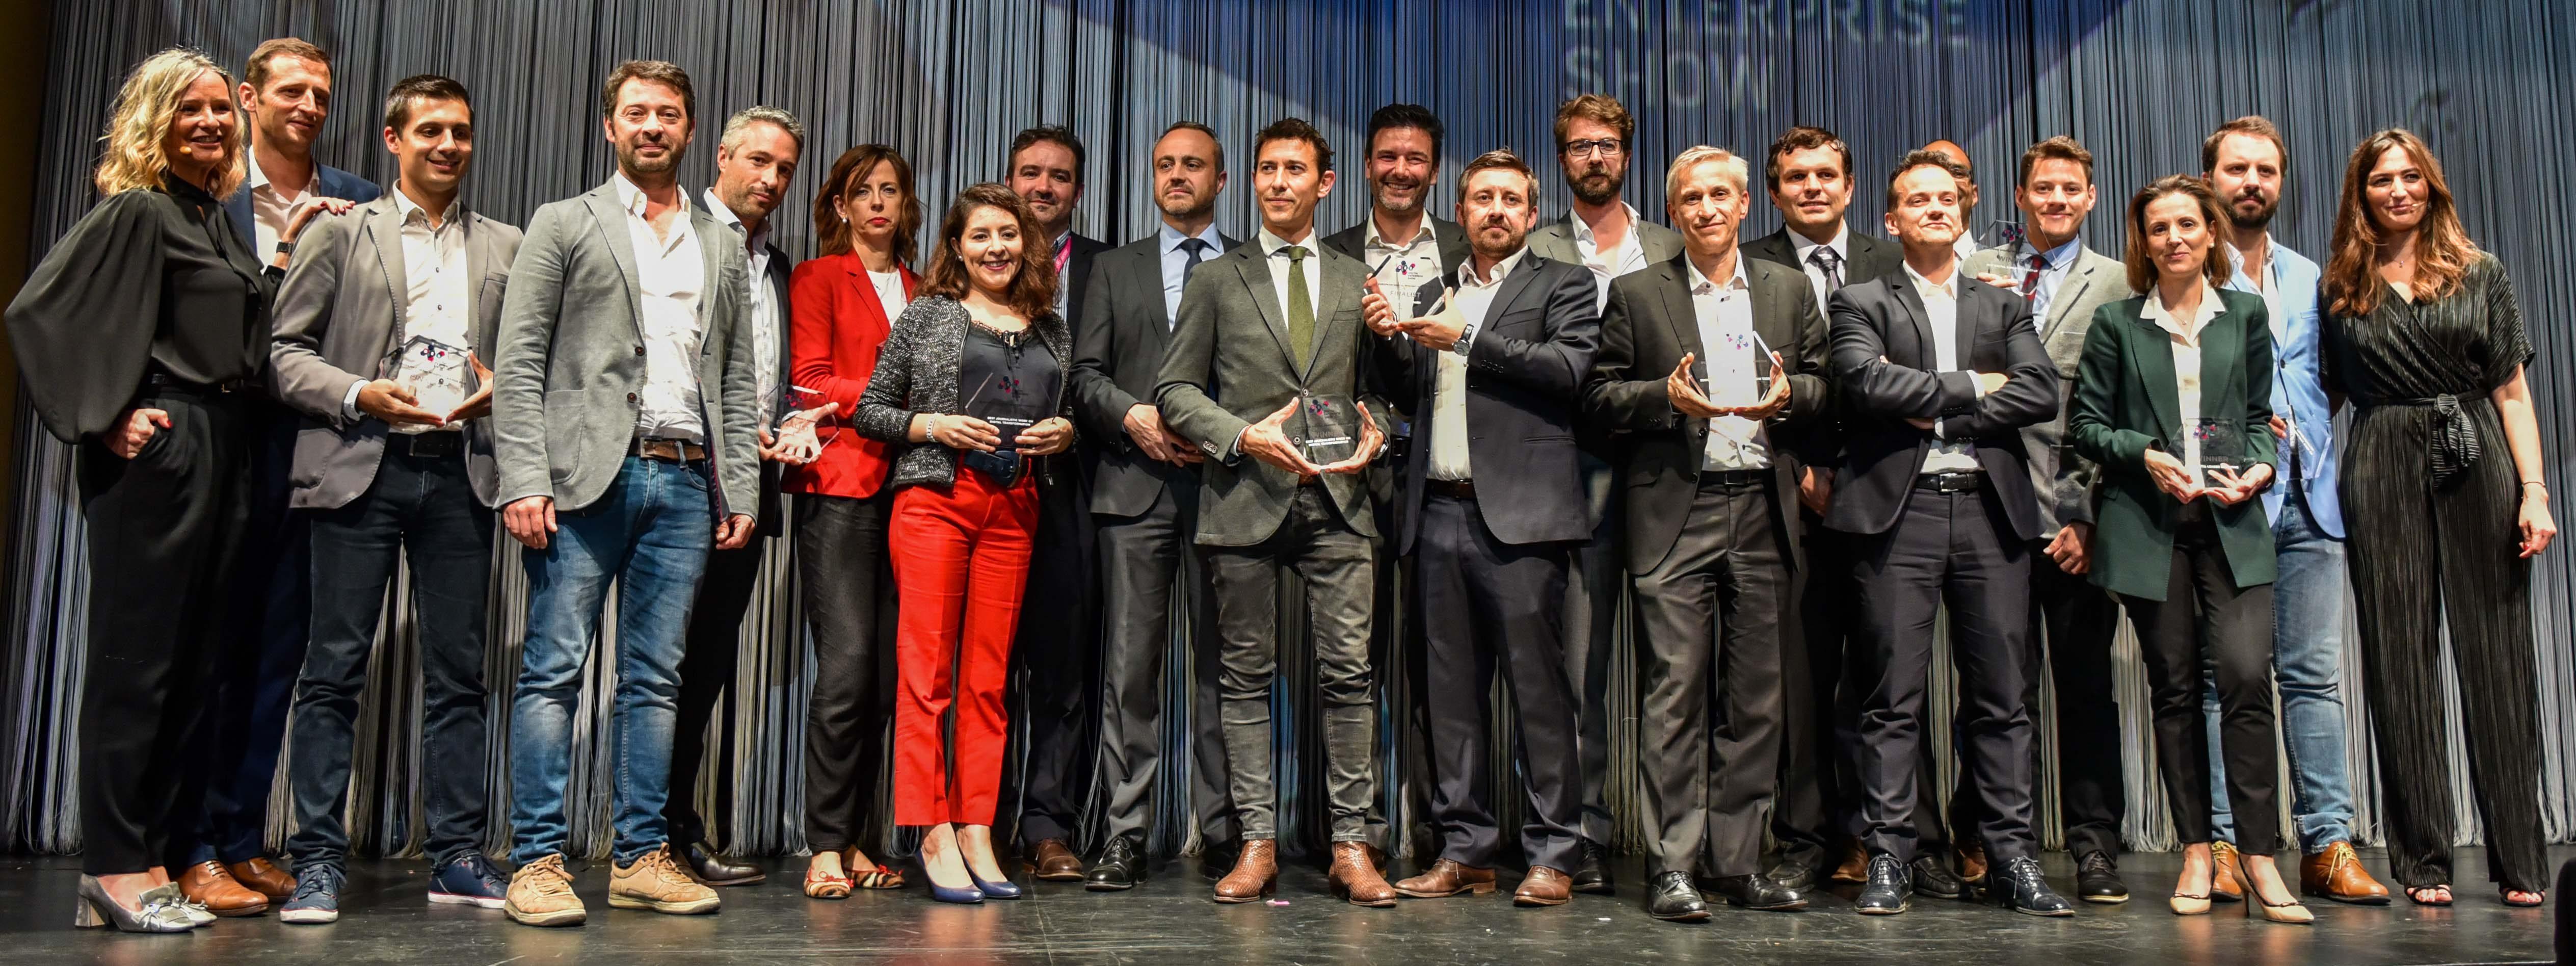 DES2019 celebrates a new edition of the European Digital Mindset Awards